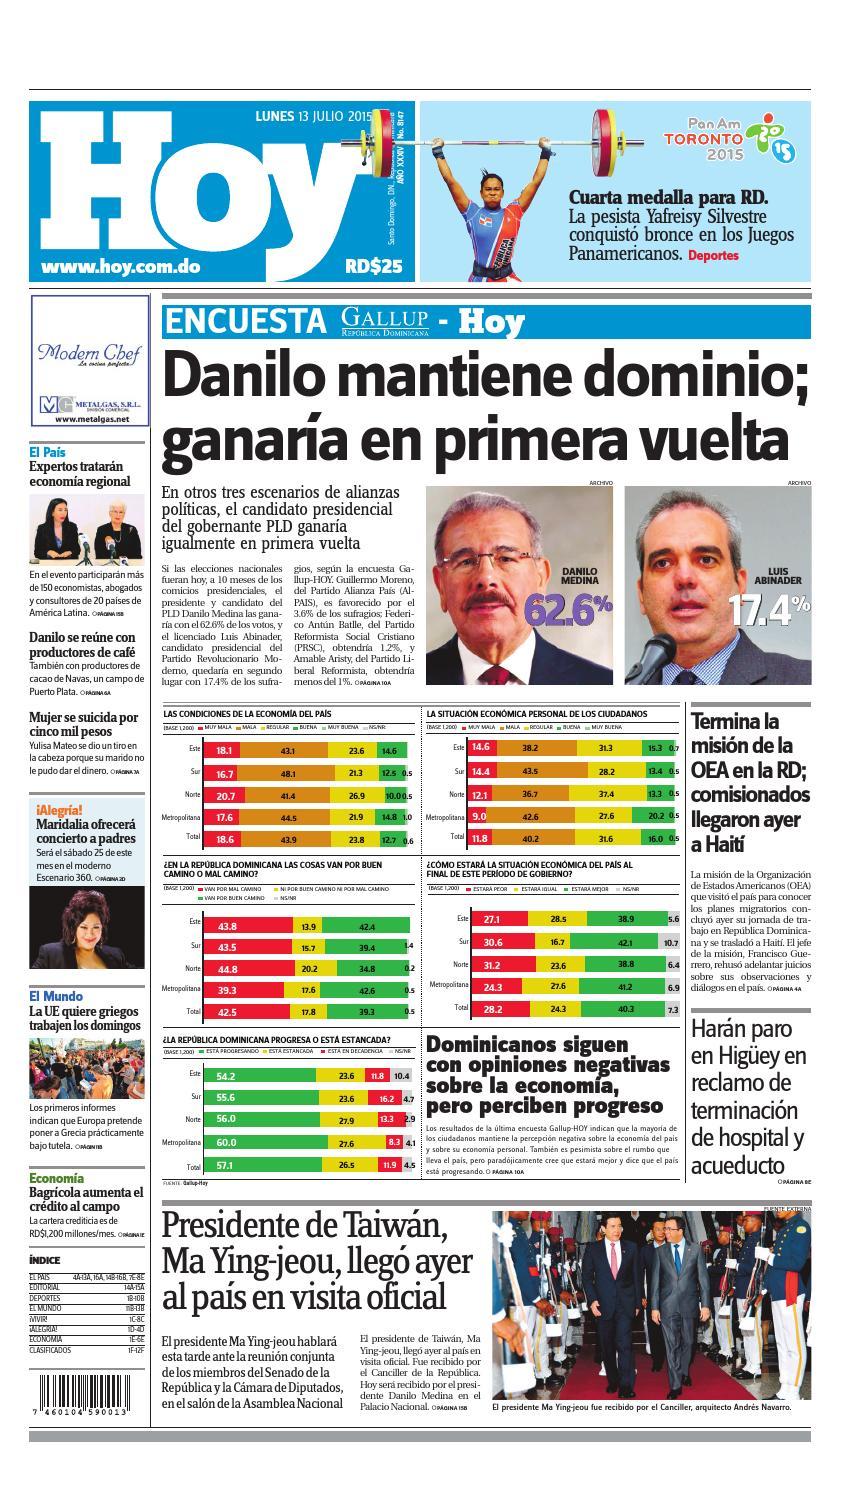 Periódico lunes 13 de julio de 2015 by Periodico Hoy - issuu 30f495b574c